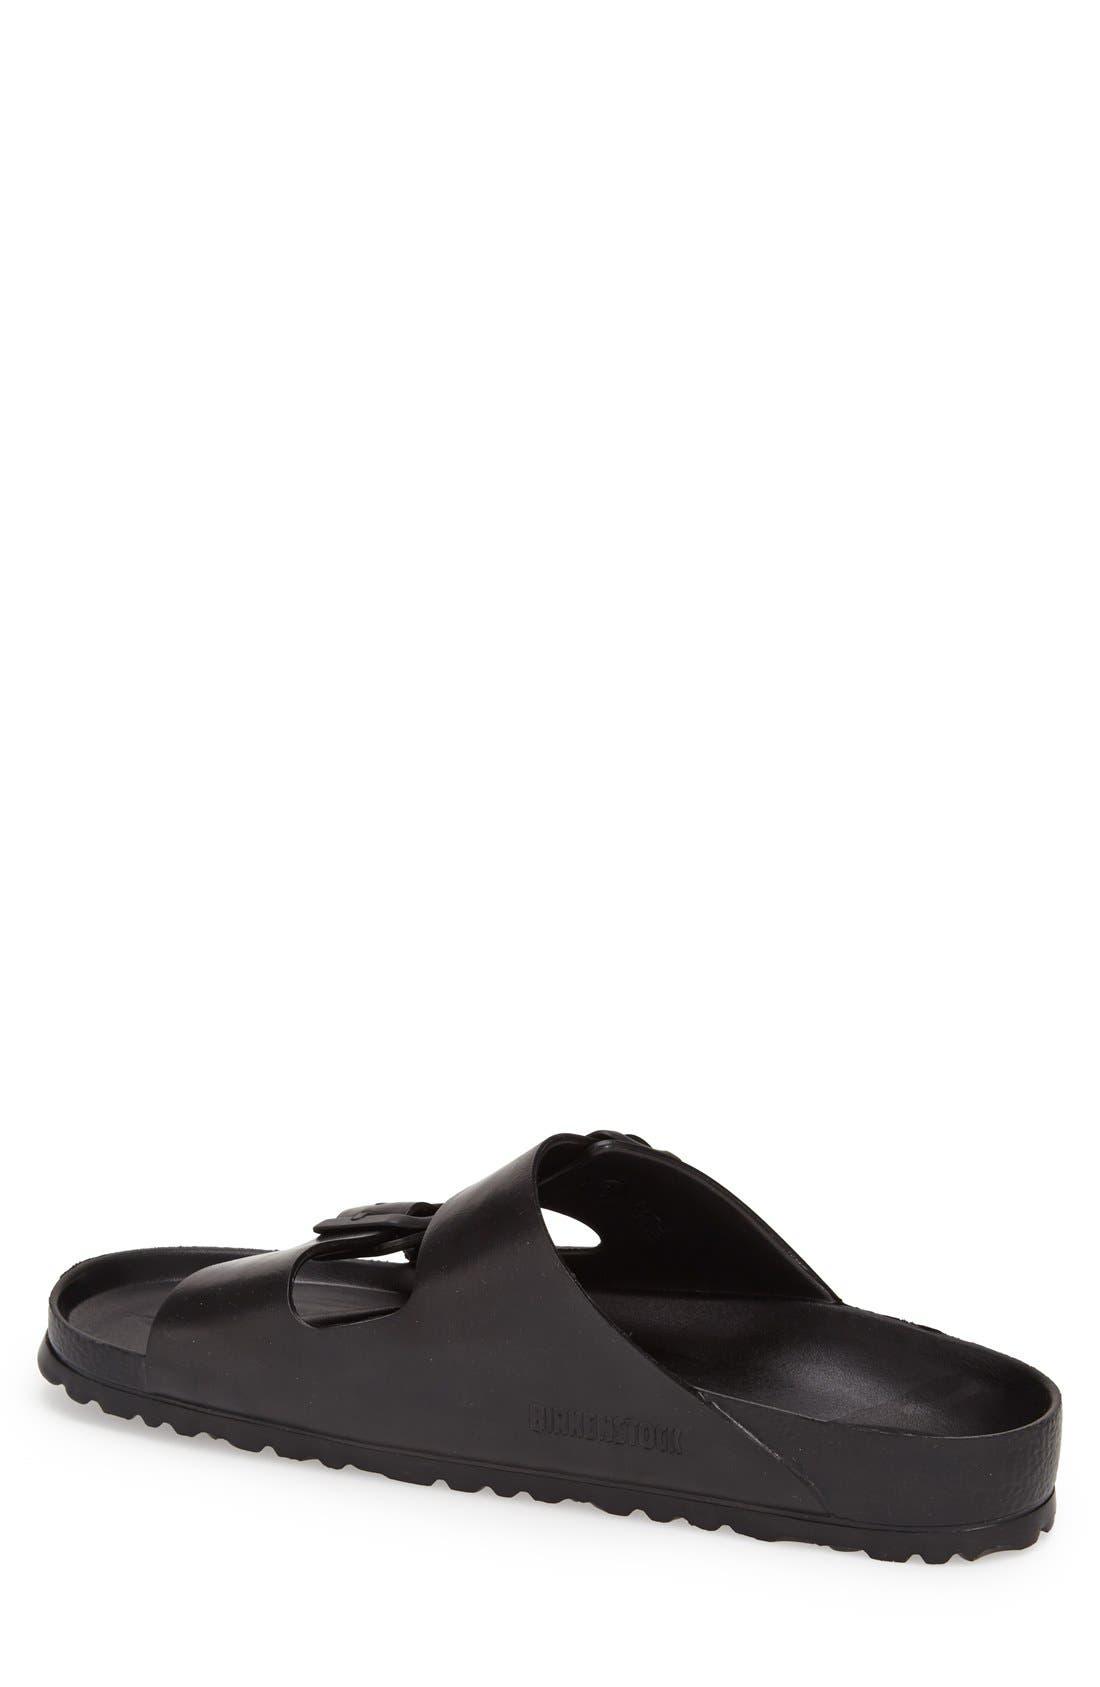 'Essentials - Arizona EVA' Waterproof Slide Sandal,                             Alternate thumbnail 2, color,                             BLACK